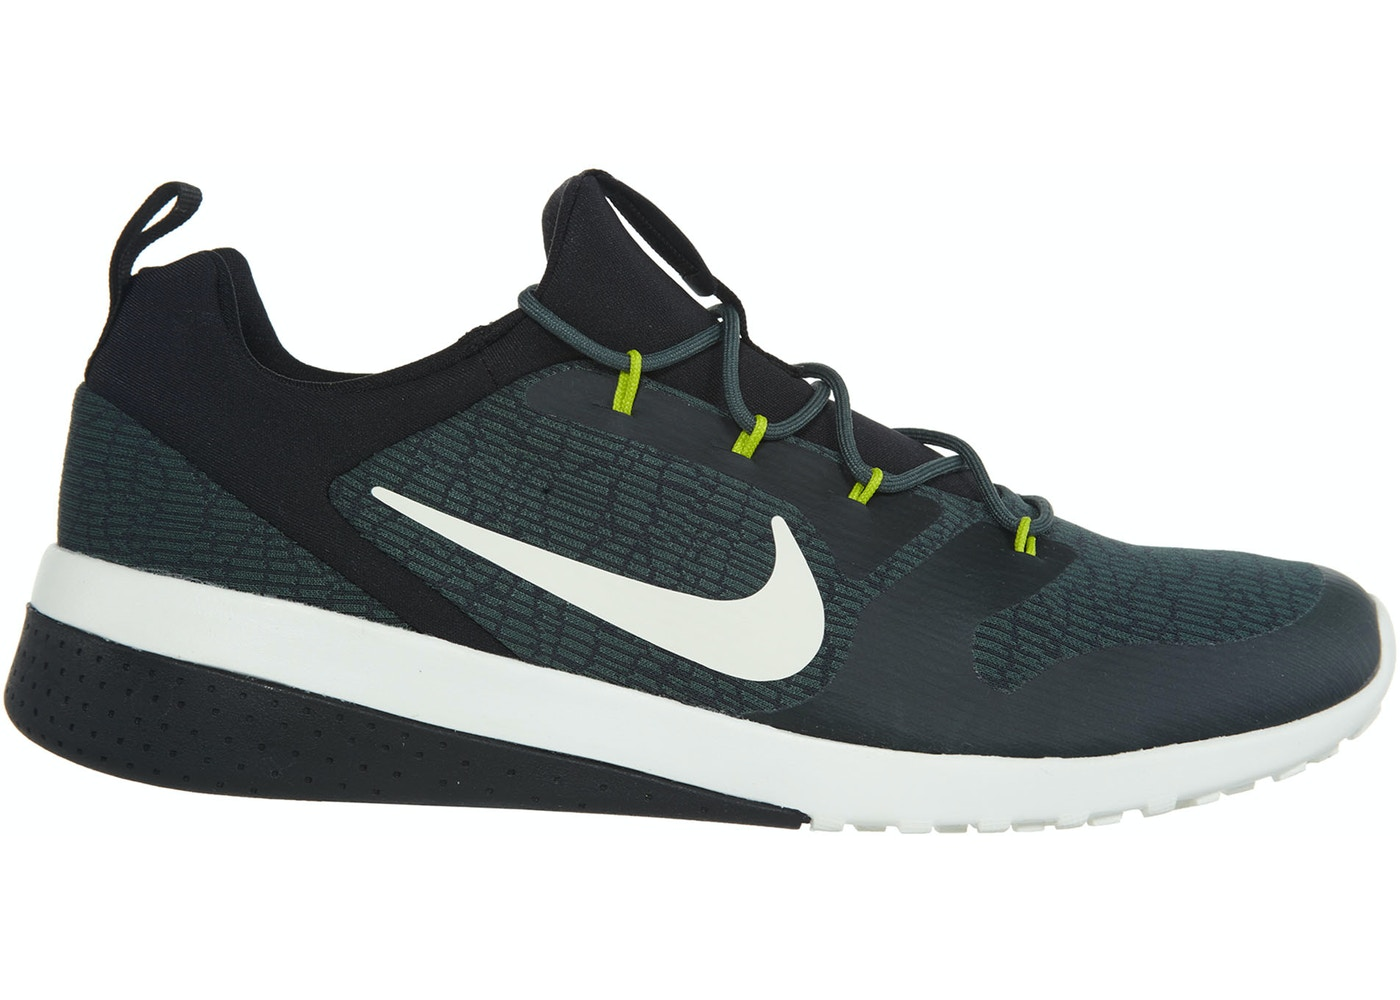 183001aa Nike Ck Racer Vintage Green/Sail-Black - 916780-301